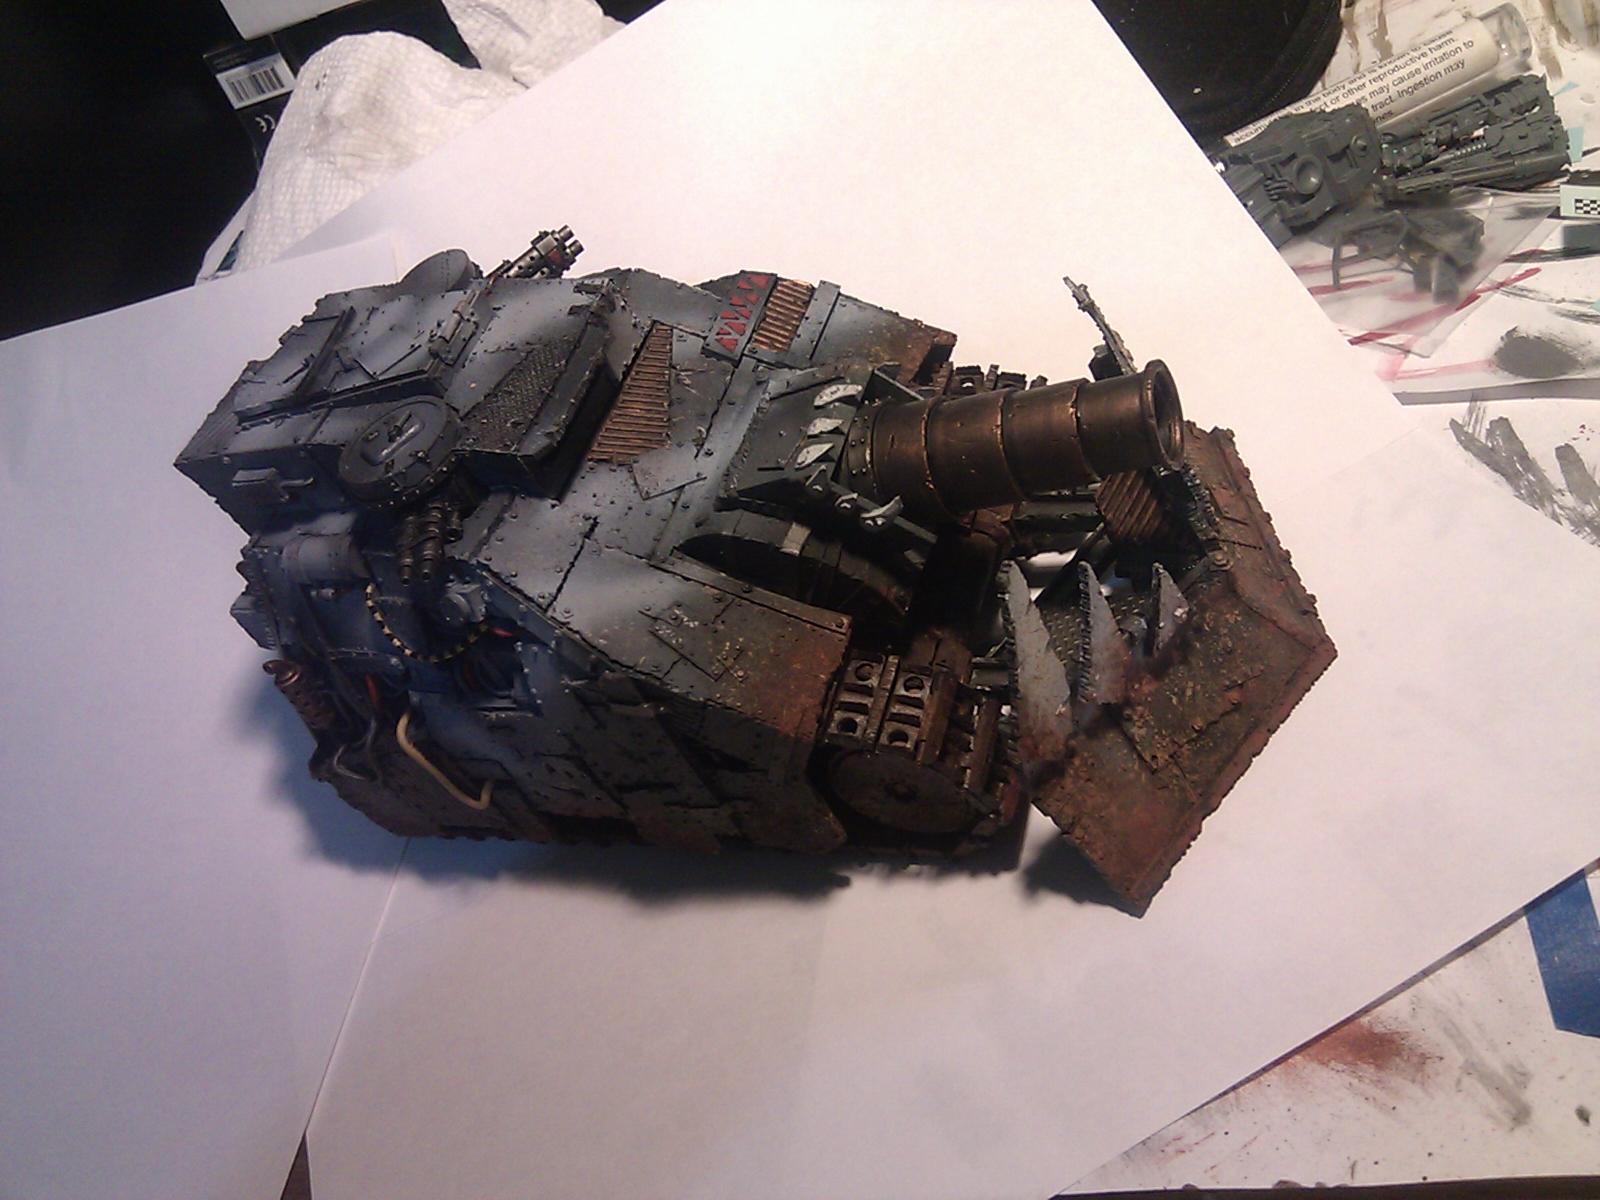 Airbrush, Forge World, Goffs, Kill Bursta, Kill Tank, Orks, Ouze, Salt Weathering, Warhammer 40,000, Work In Progress